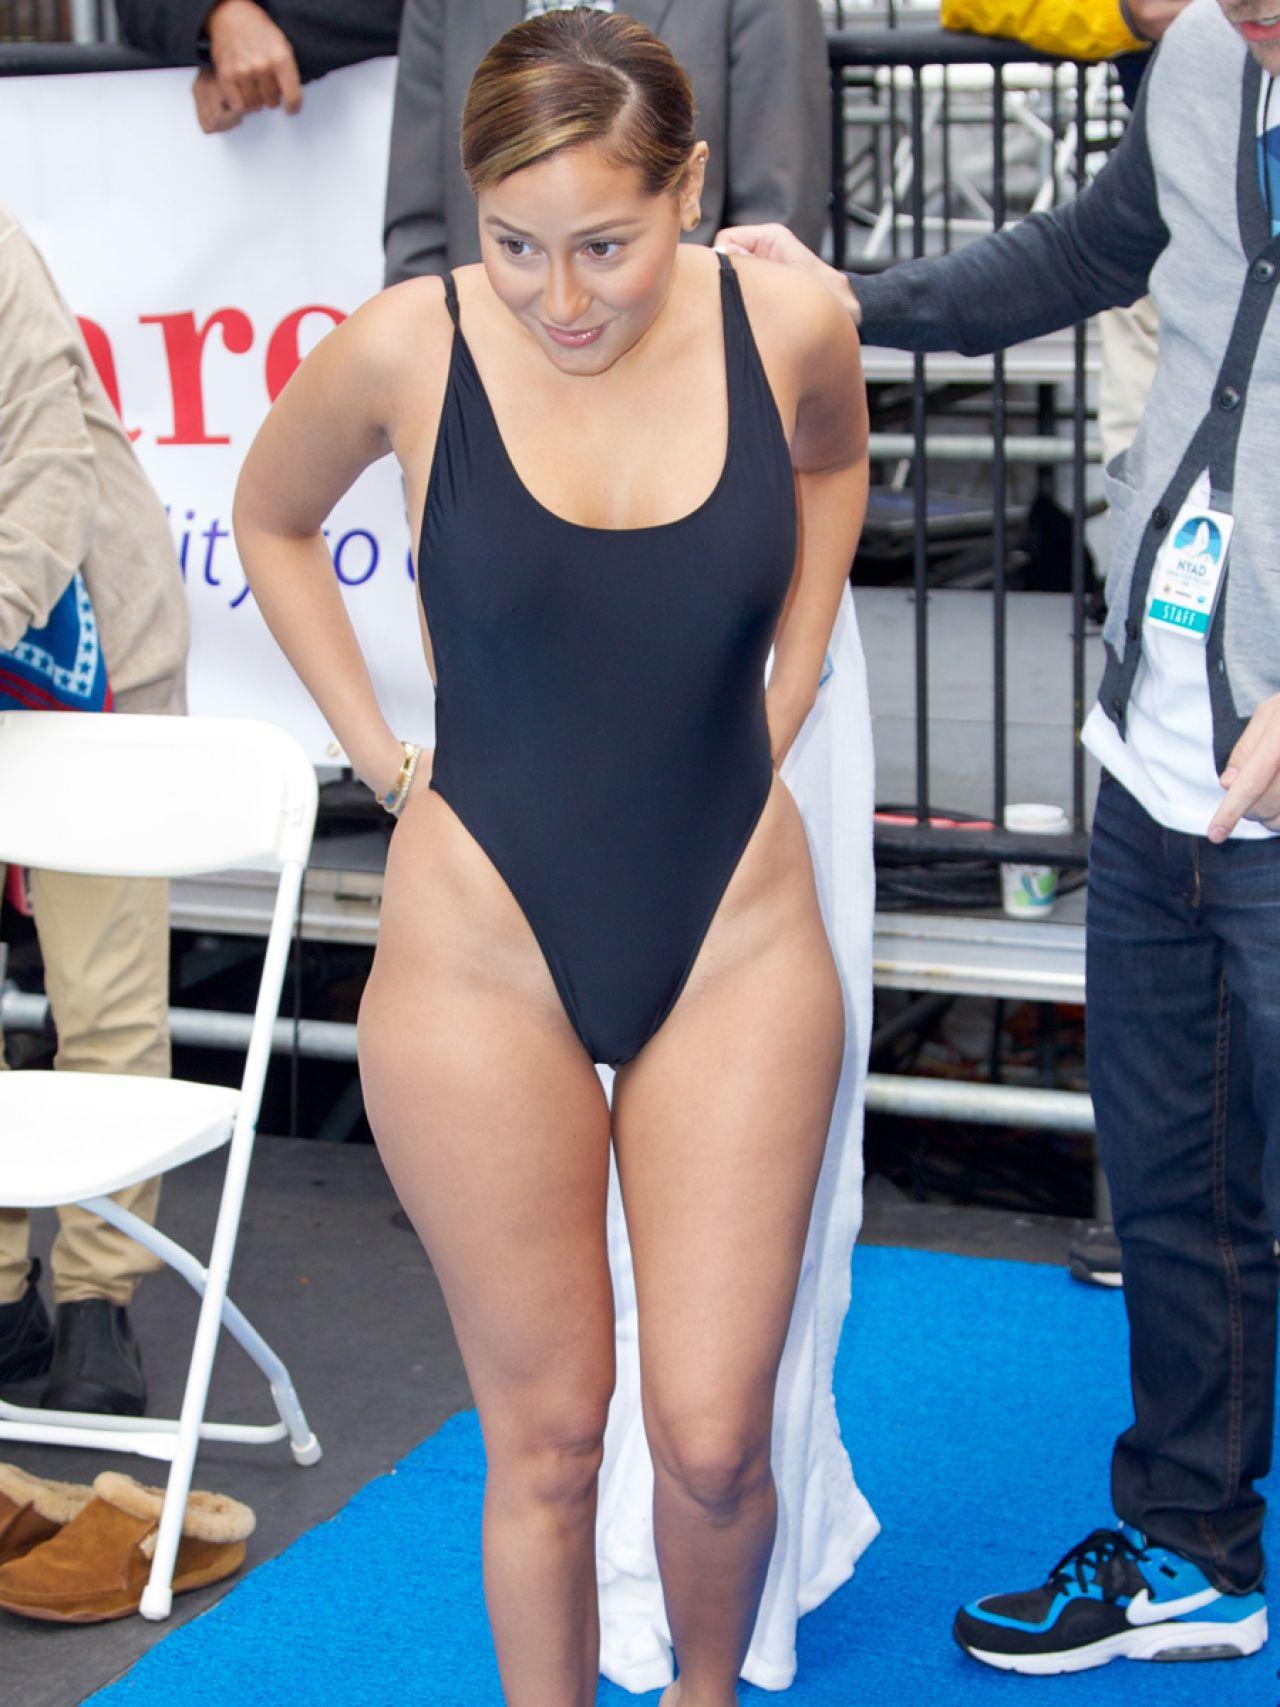 Tahnee Atkinson nudes (95 foto and video), Topless, Is a cute, Instagram, bra 2015